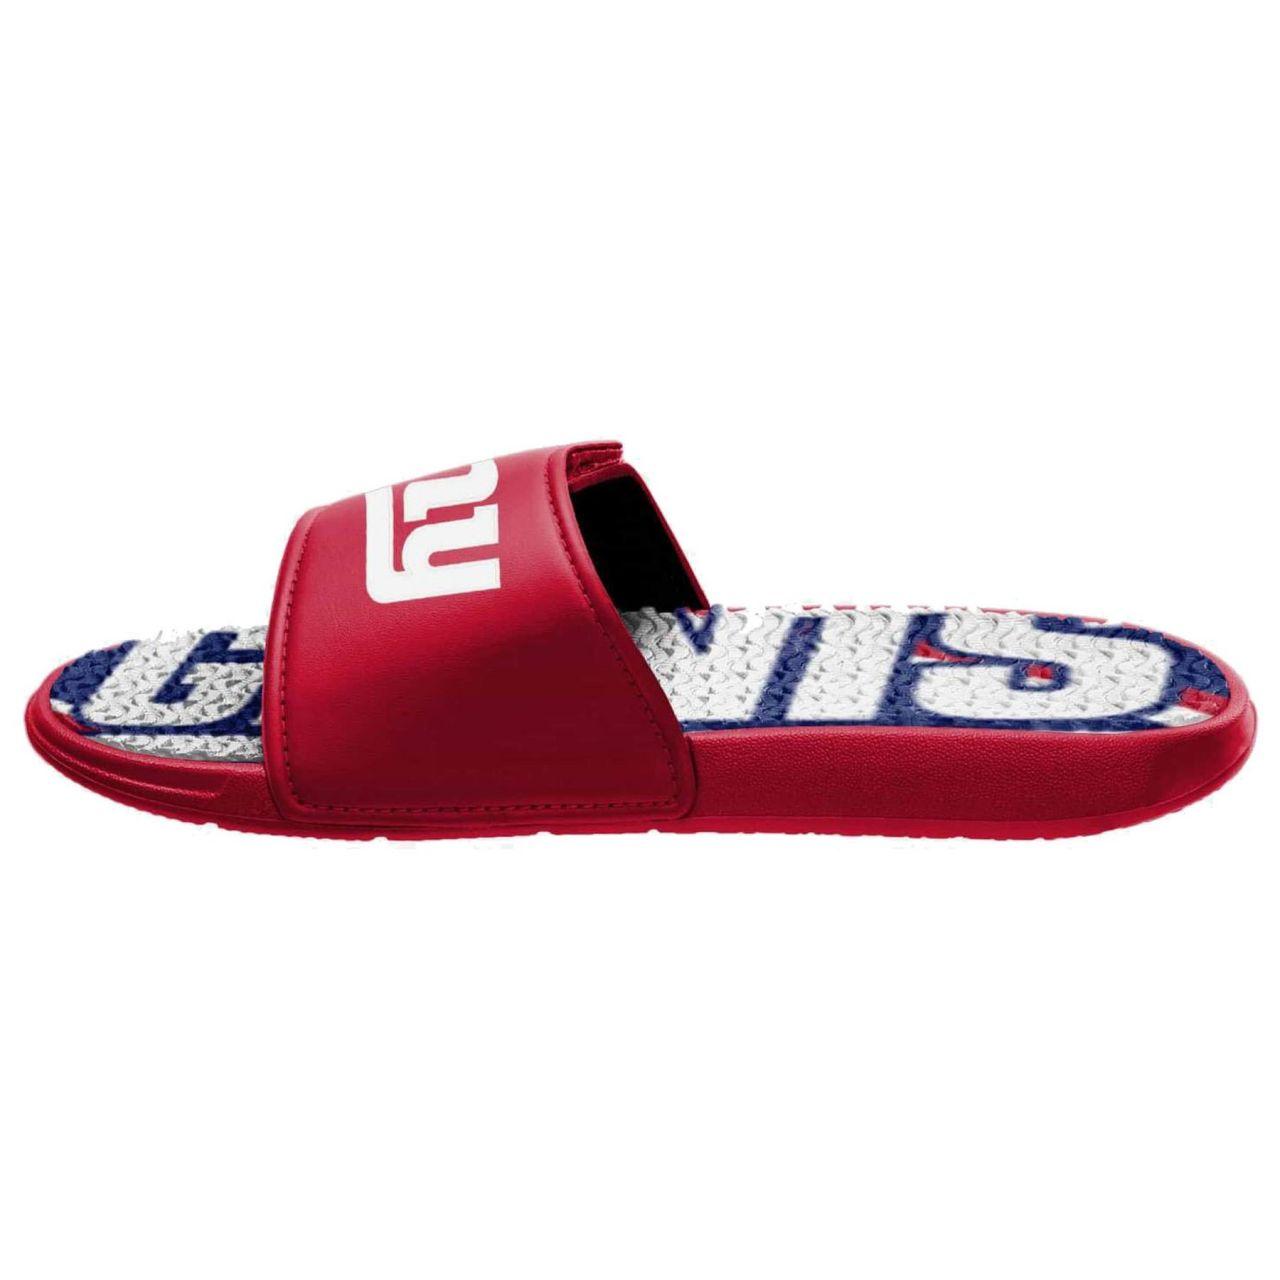 amfoo - New York Giants Badelatschen NFL GEL Sport Slides